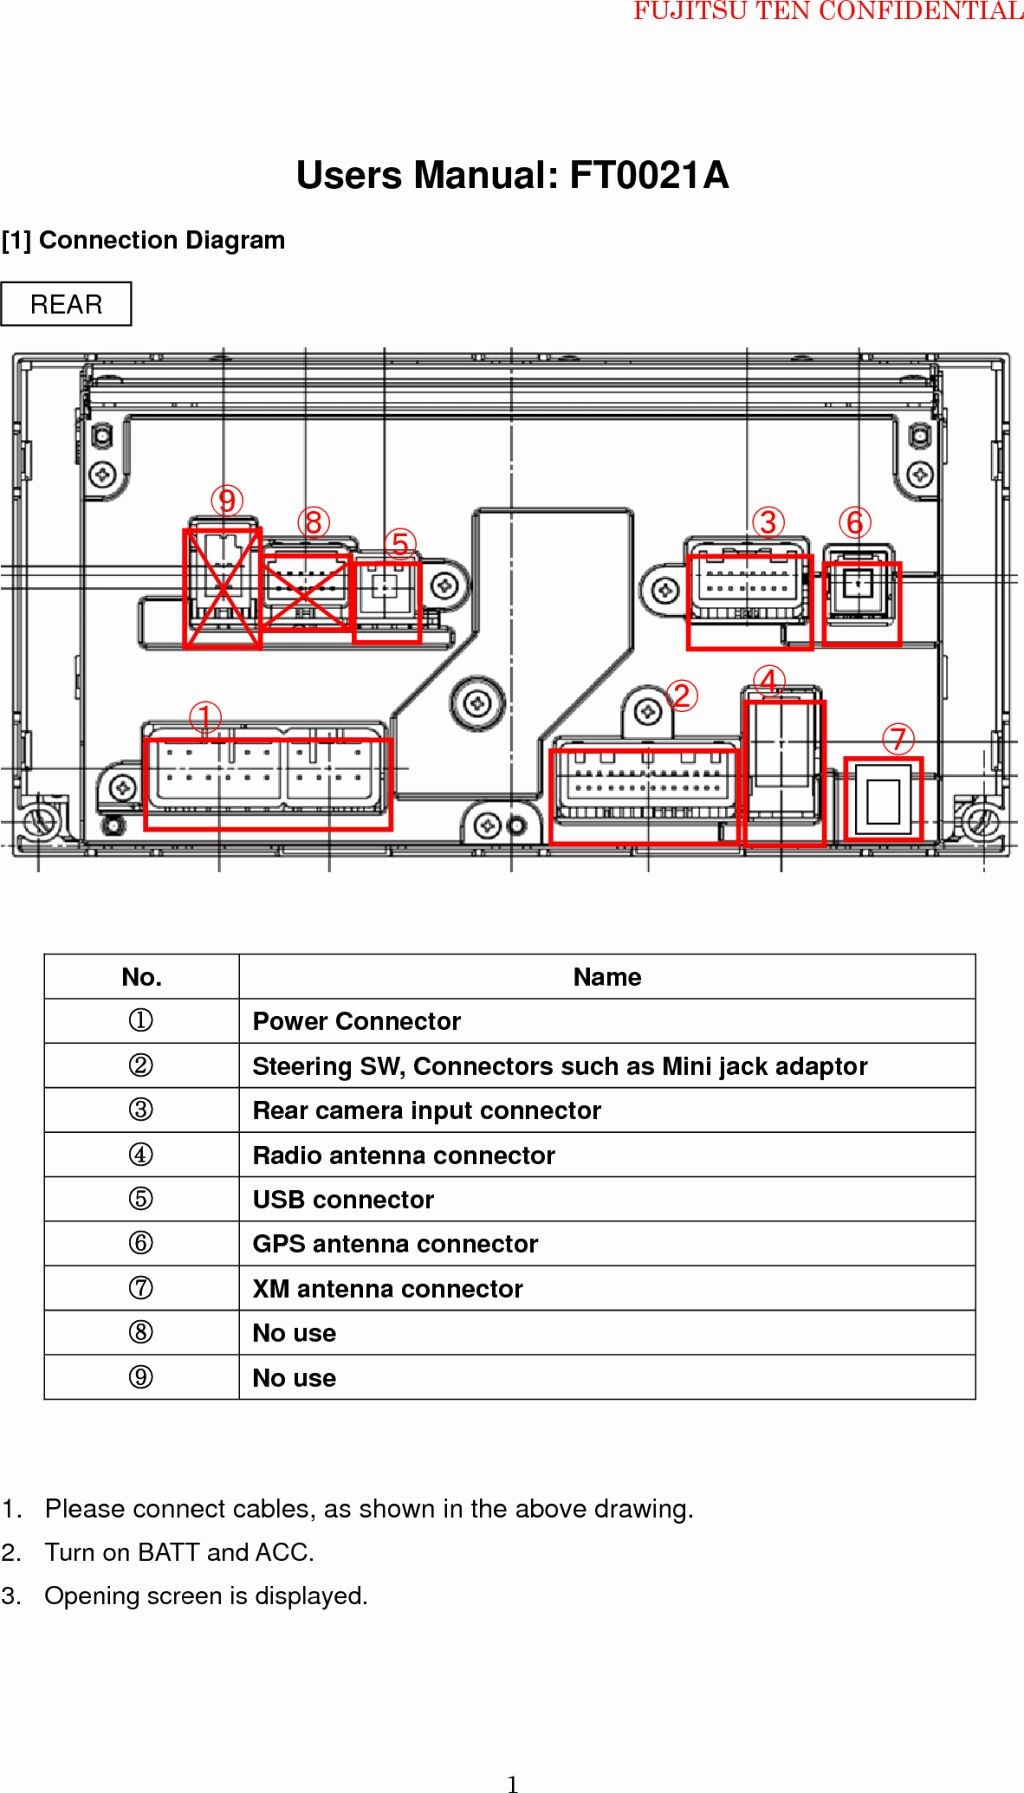 Toyota Fujitsu 14 Wiring Diagram Data Wiring Diagram Toyota Fujitsu 14 Wiring Diagram